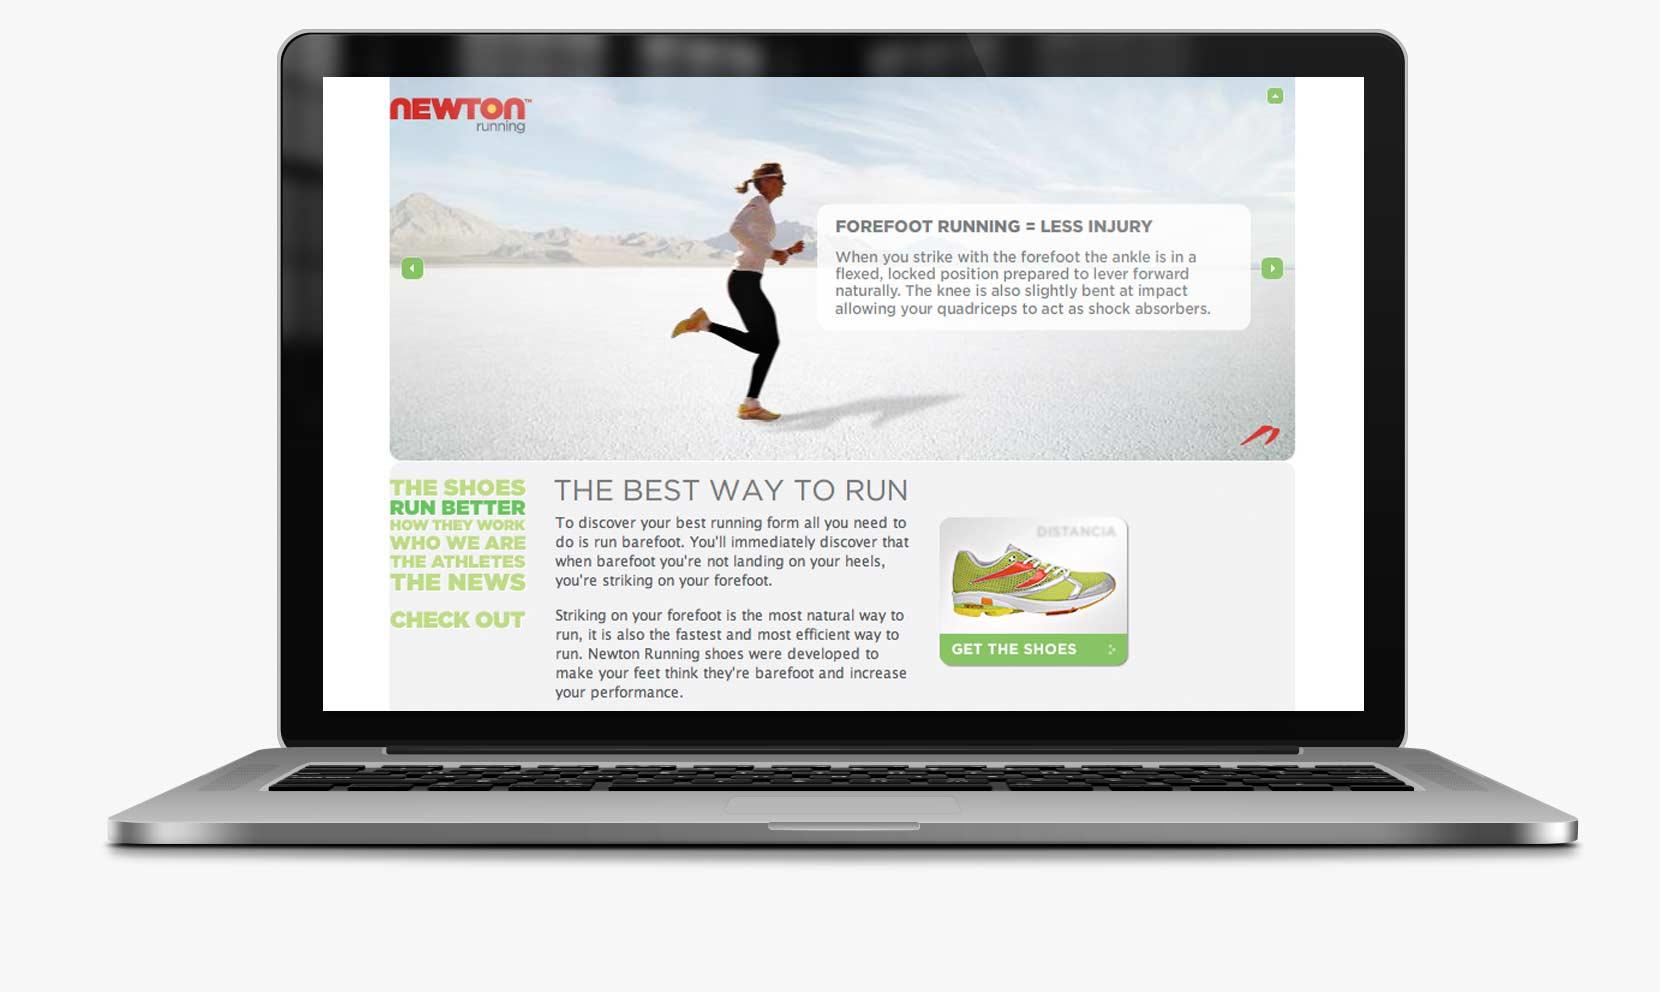 Newton-Running-Shoe_website-design_commerce_run.jpg